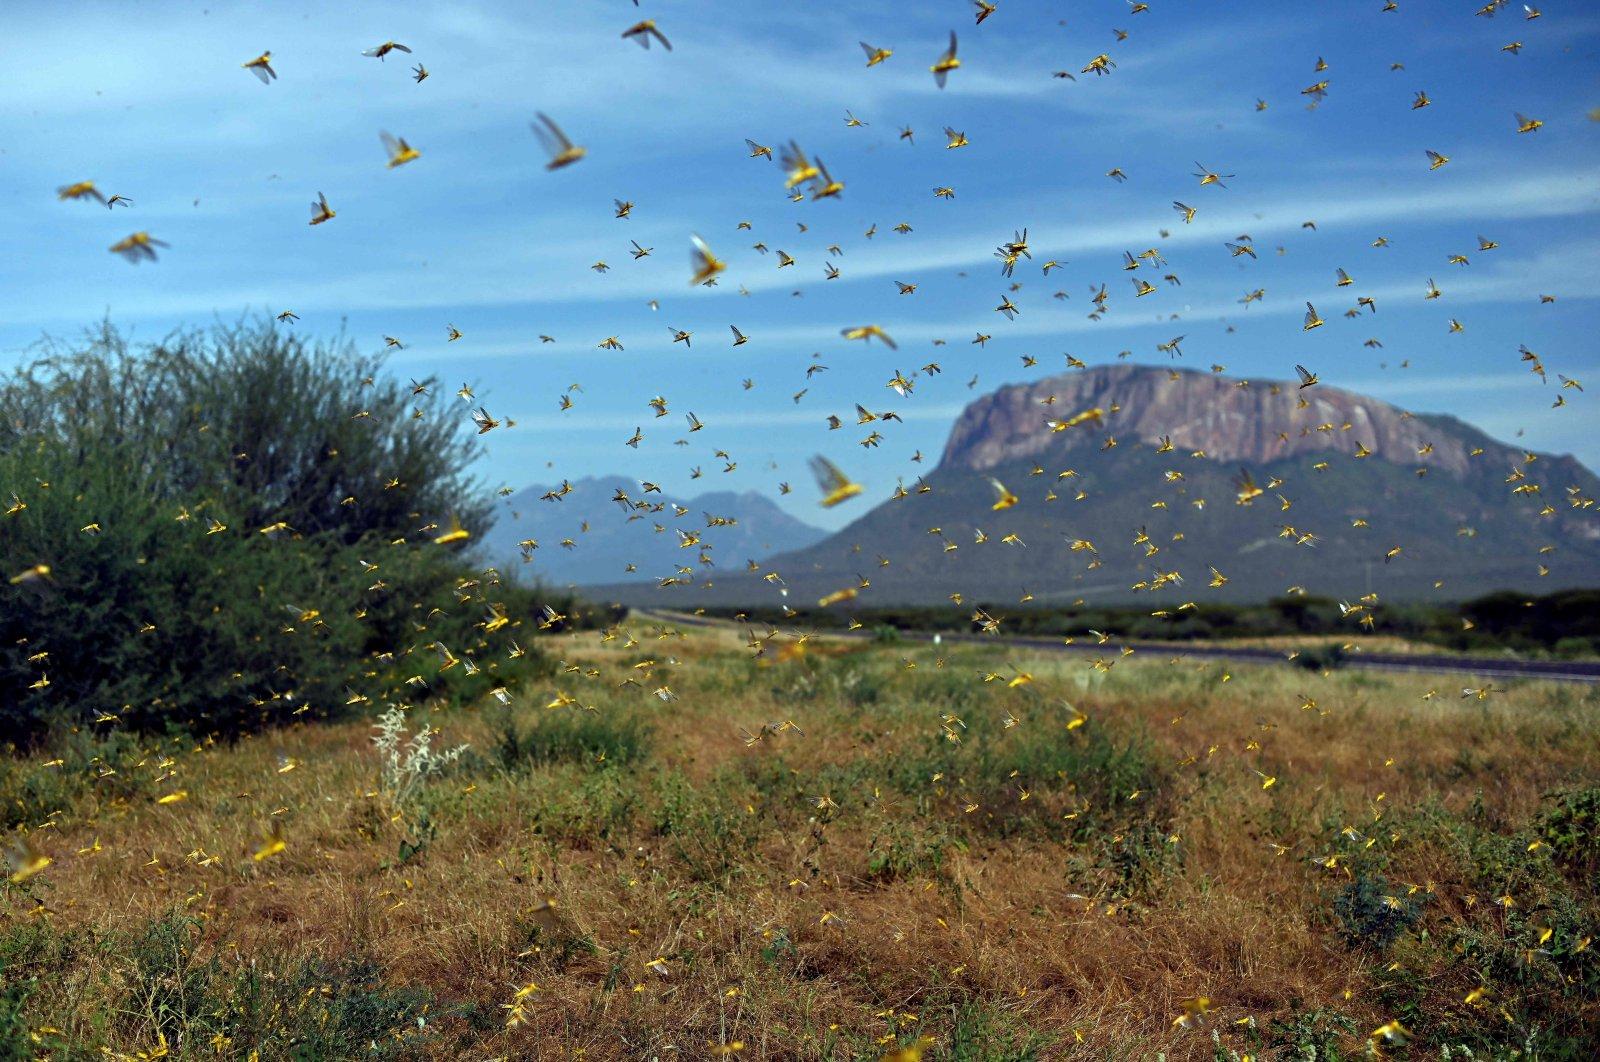 Locusts swarm from ground vegetation as people approach at Lerata village, near Archers Post in Samburu county, approximately 300 kilometers (186 miles) north of the Kenyan capital, Nairobi, Jan. 22, 2020. (AFP Photo)